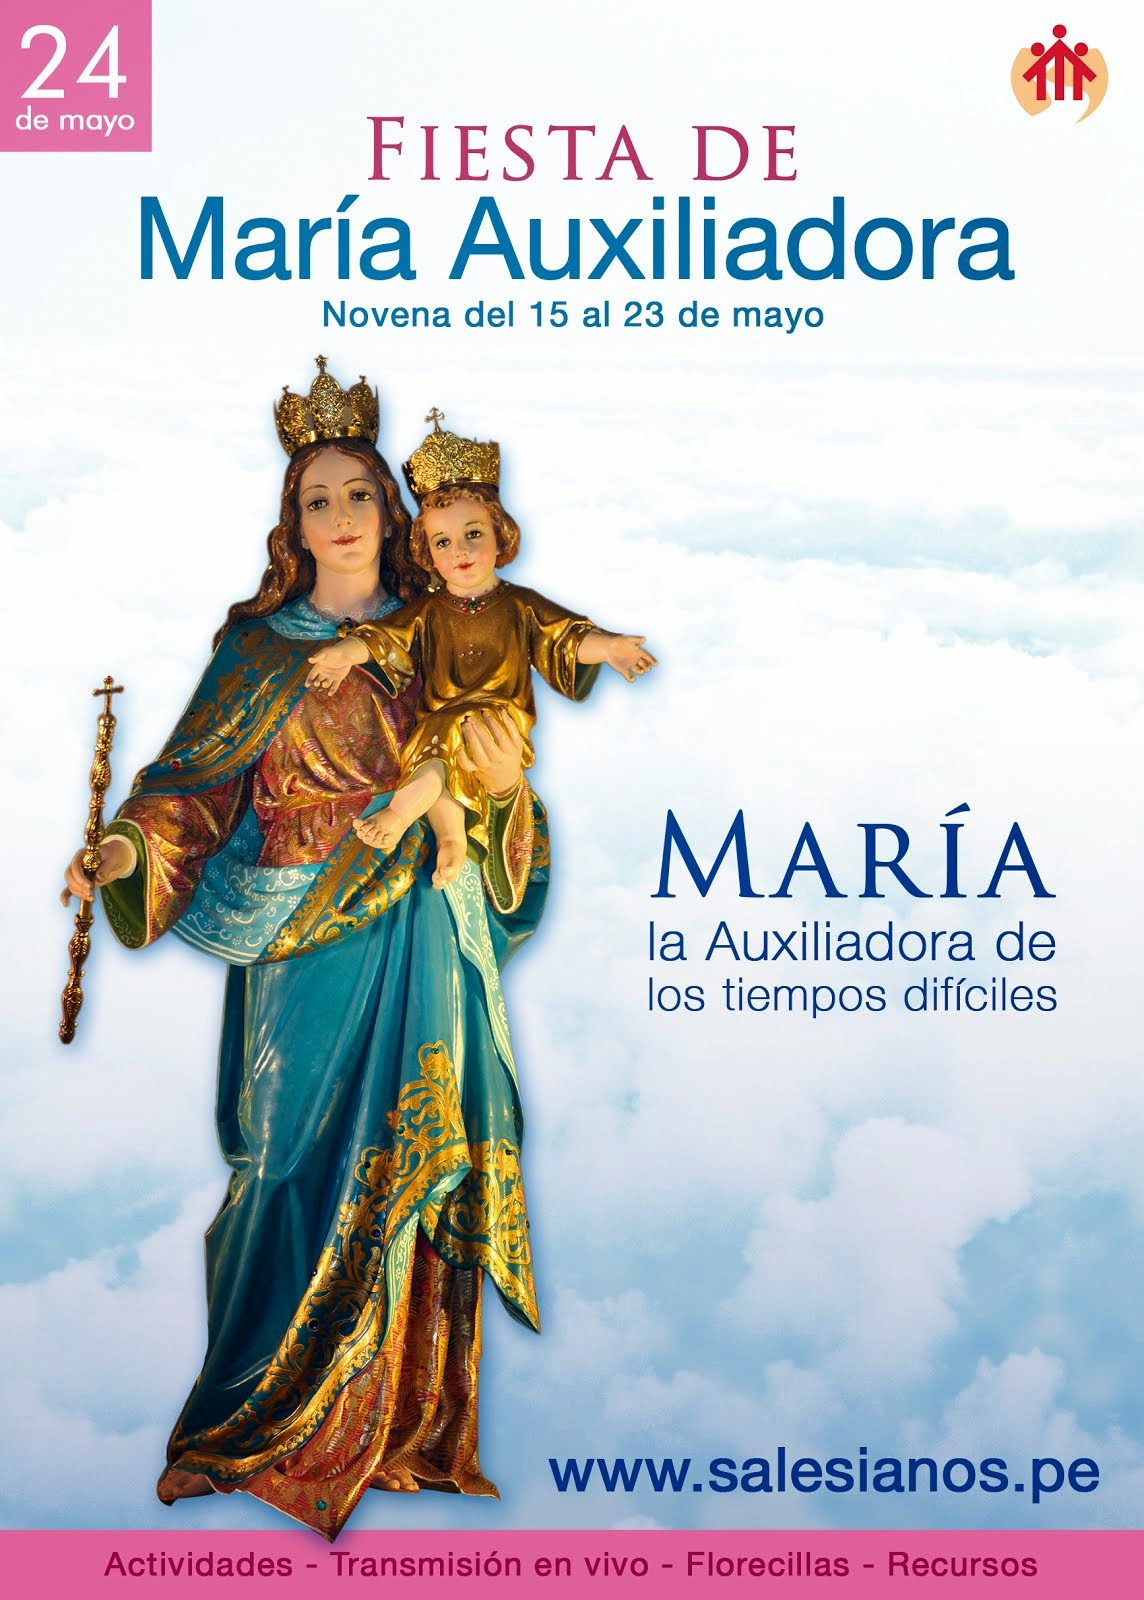 Fiesta de Maria Auxiliadora - Peru 2015